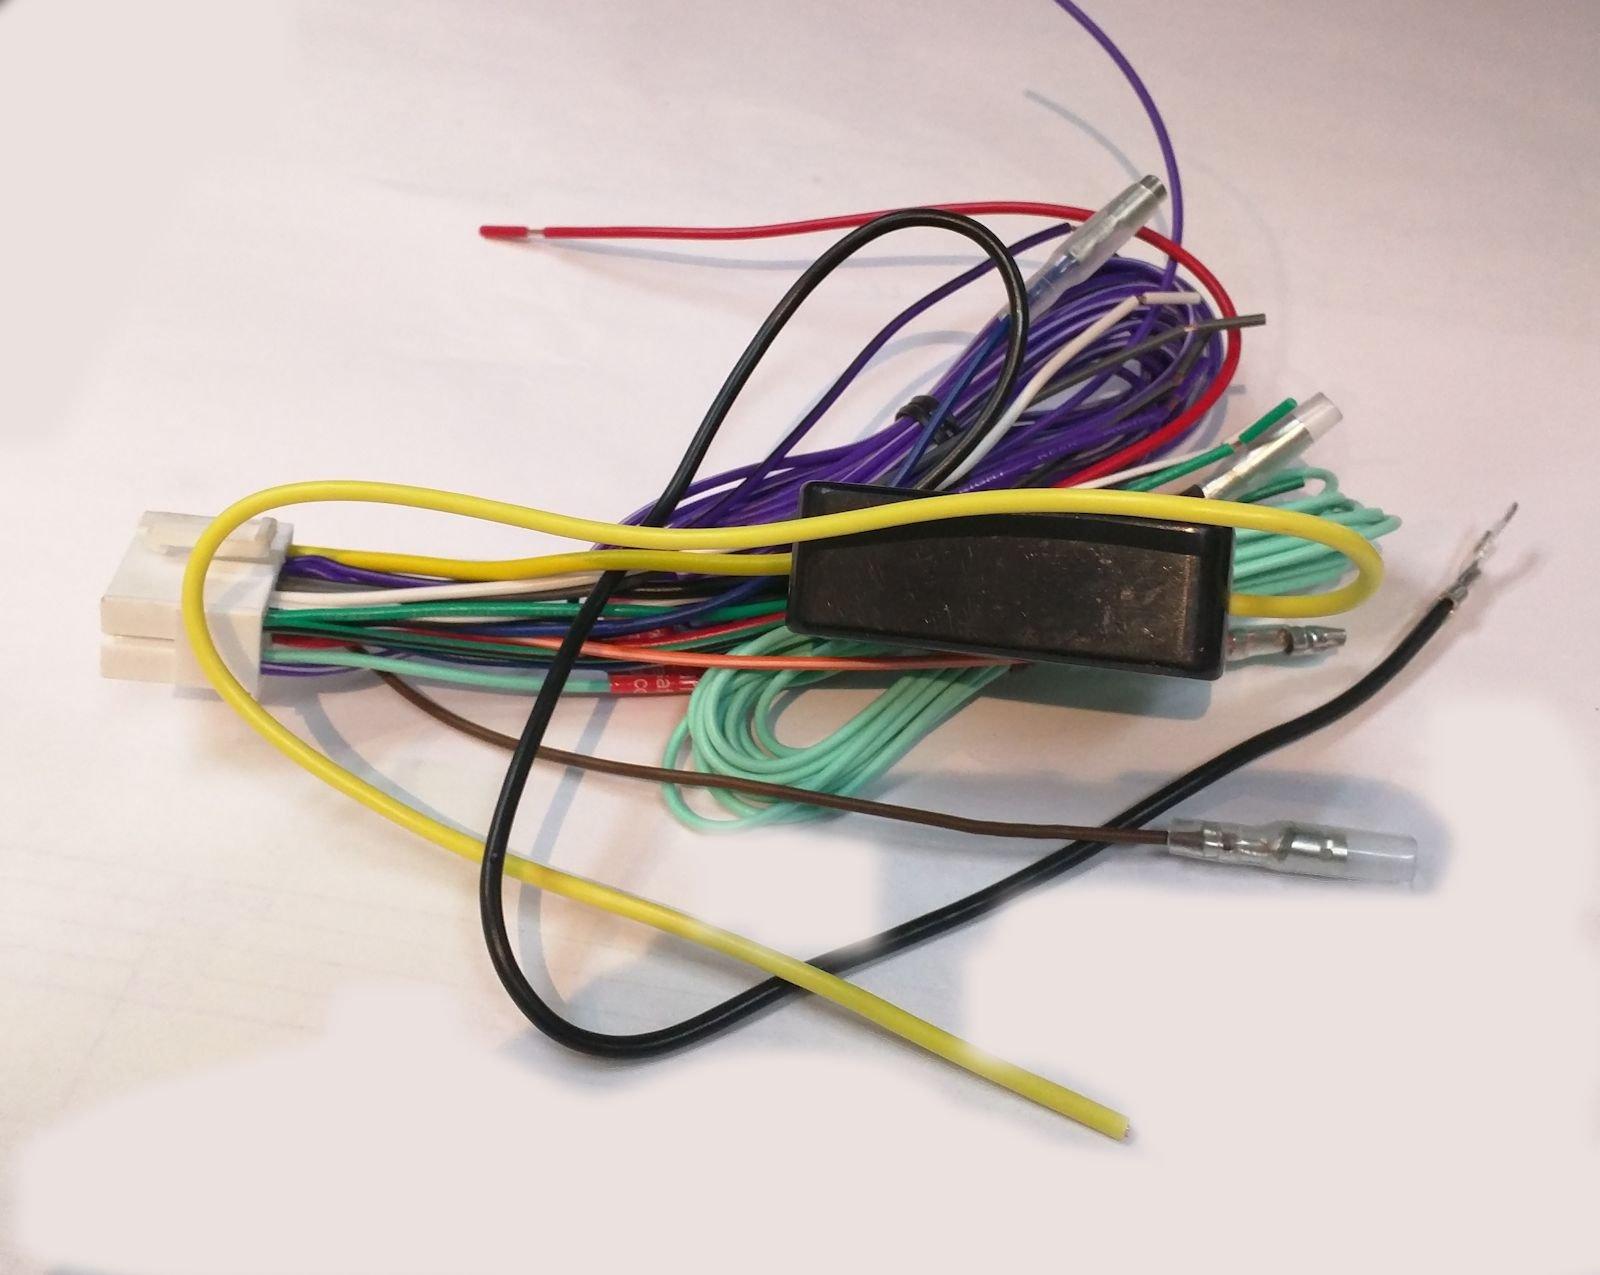 E D Be D Dd Bf C B E on Clarion 16 Pin Wiring Harness Colors